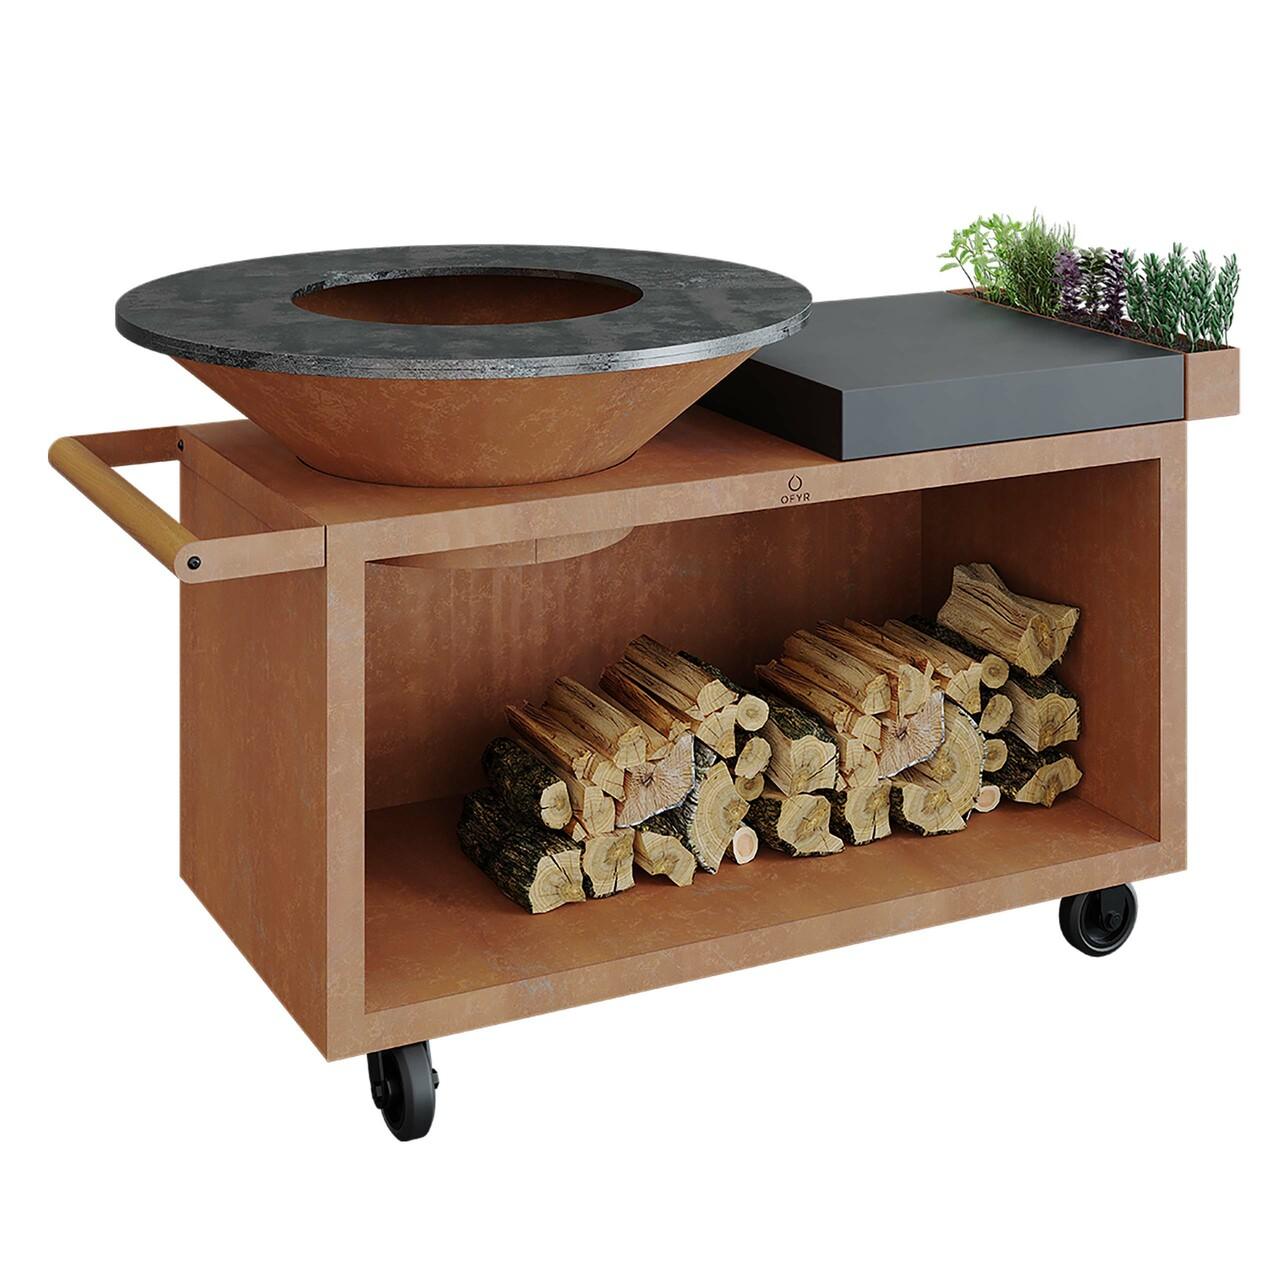 Ofyr Grill-Outdoorkücheninsel 'Cooking Unit Island Pro' Schwarz beschichteter Stahl, Dunkelgraues Keramik